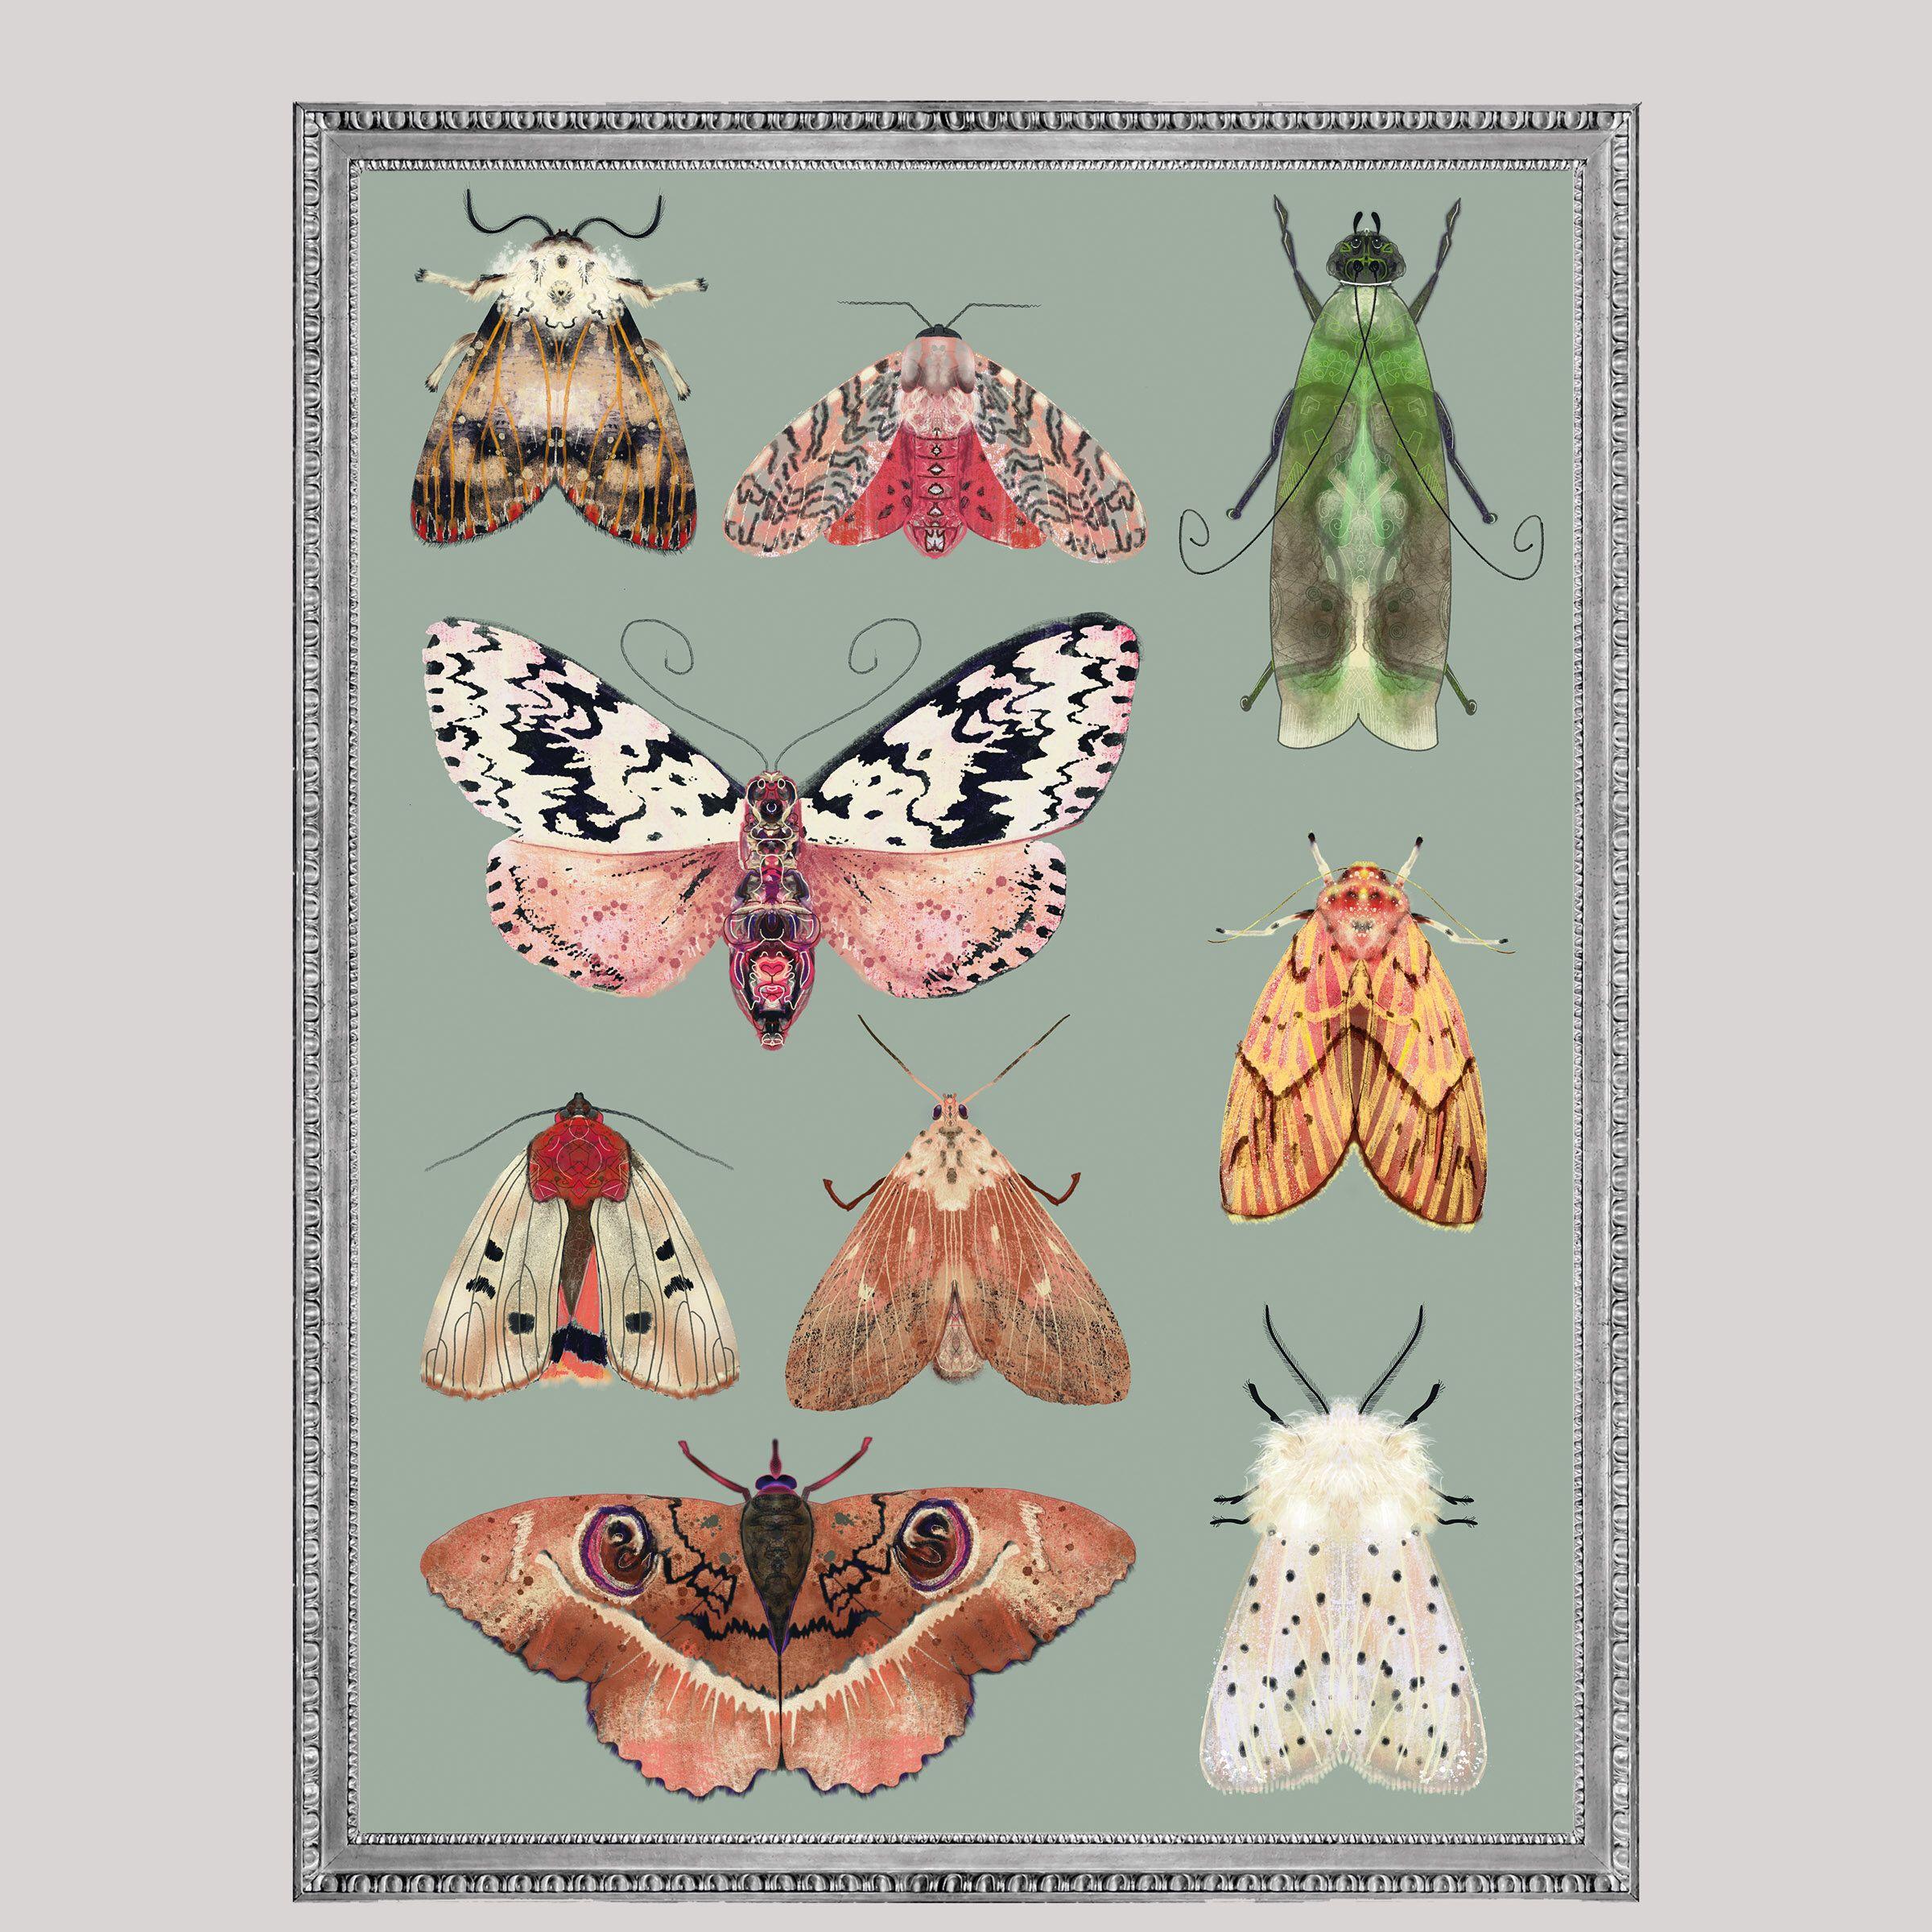 Motten Collage Groen Digitale Insectenprint Afdrukbare Kunst Aan De Muur Digital Print Illustration Blogger Themes Butterfly